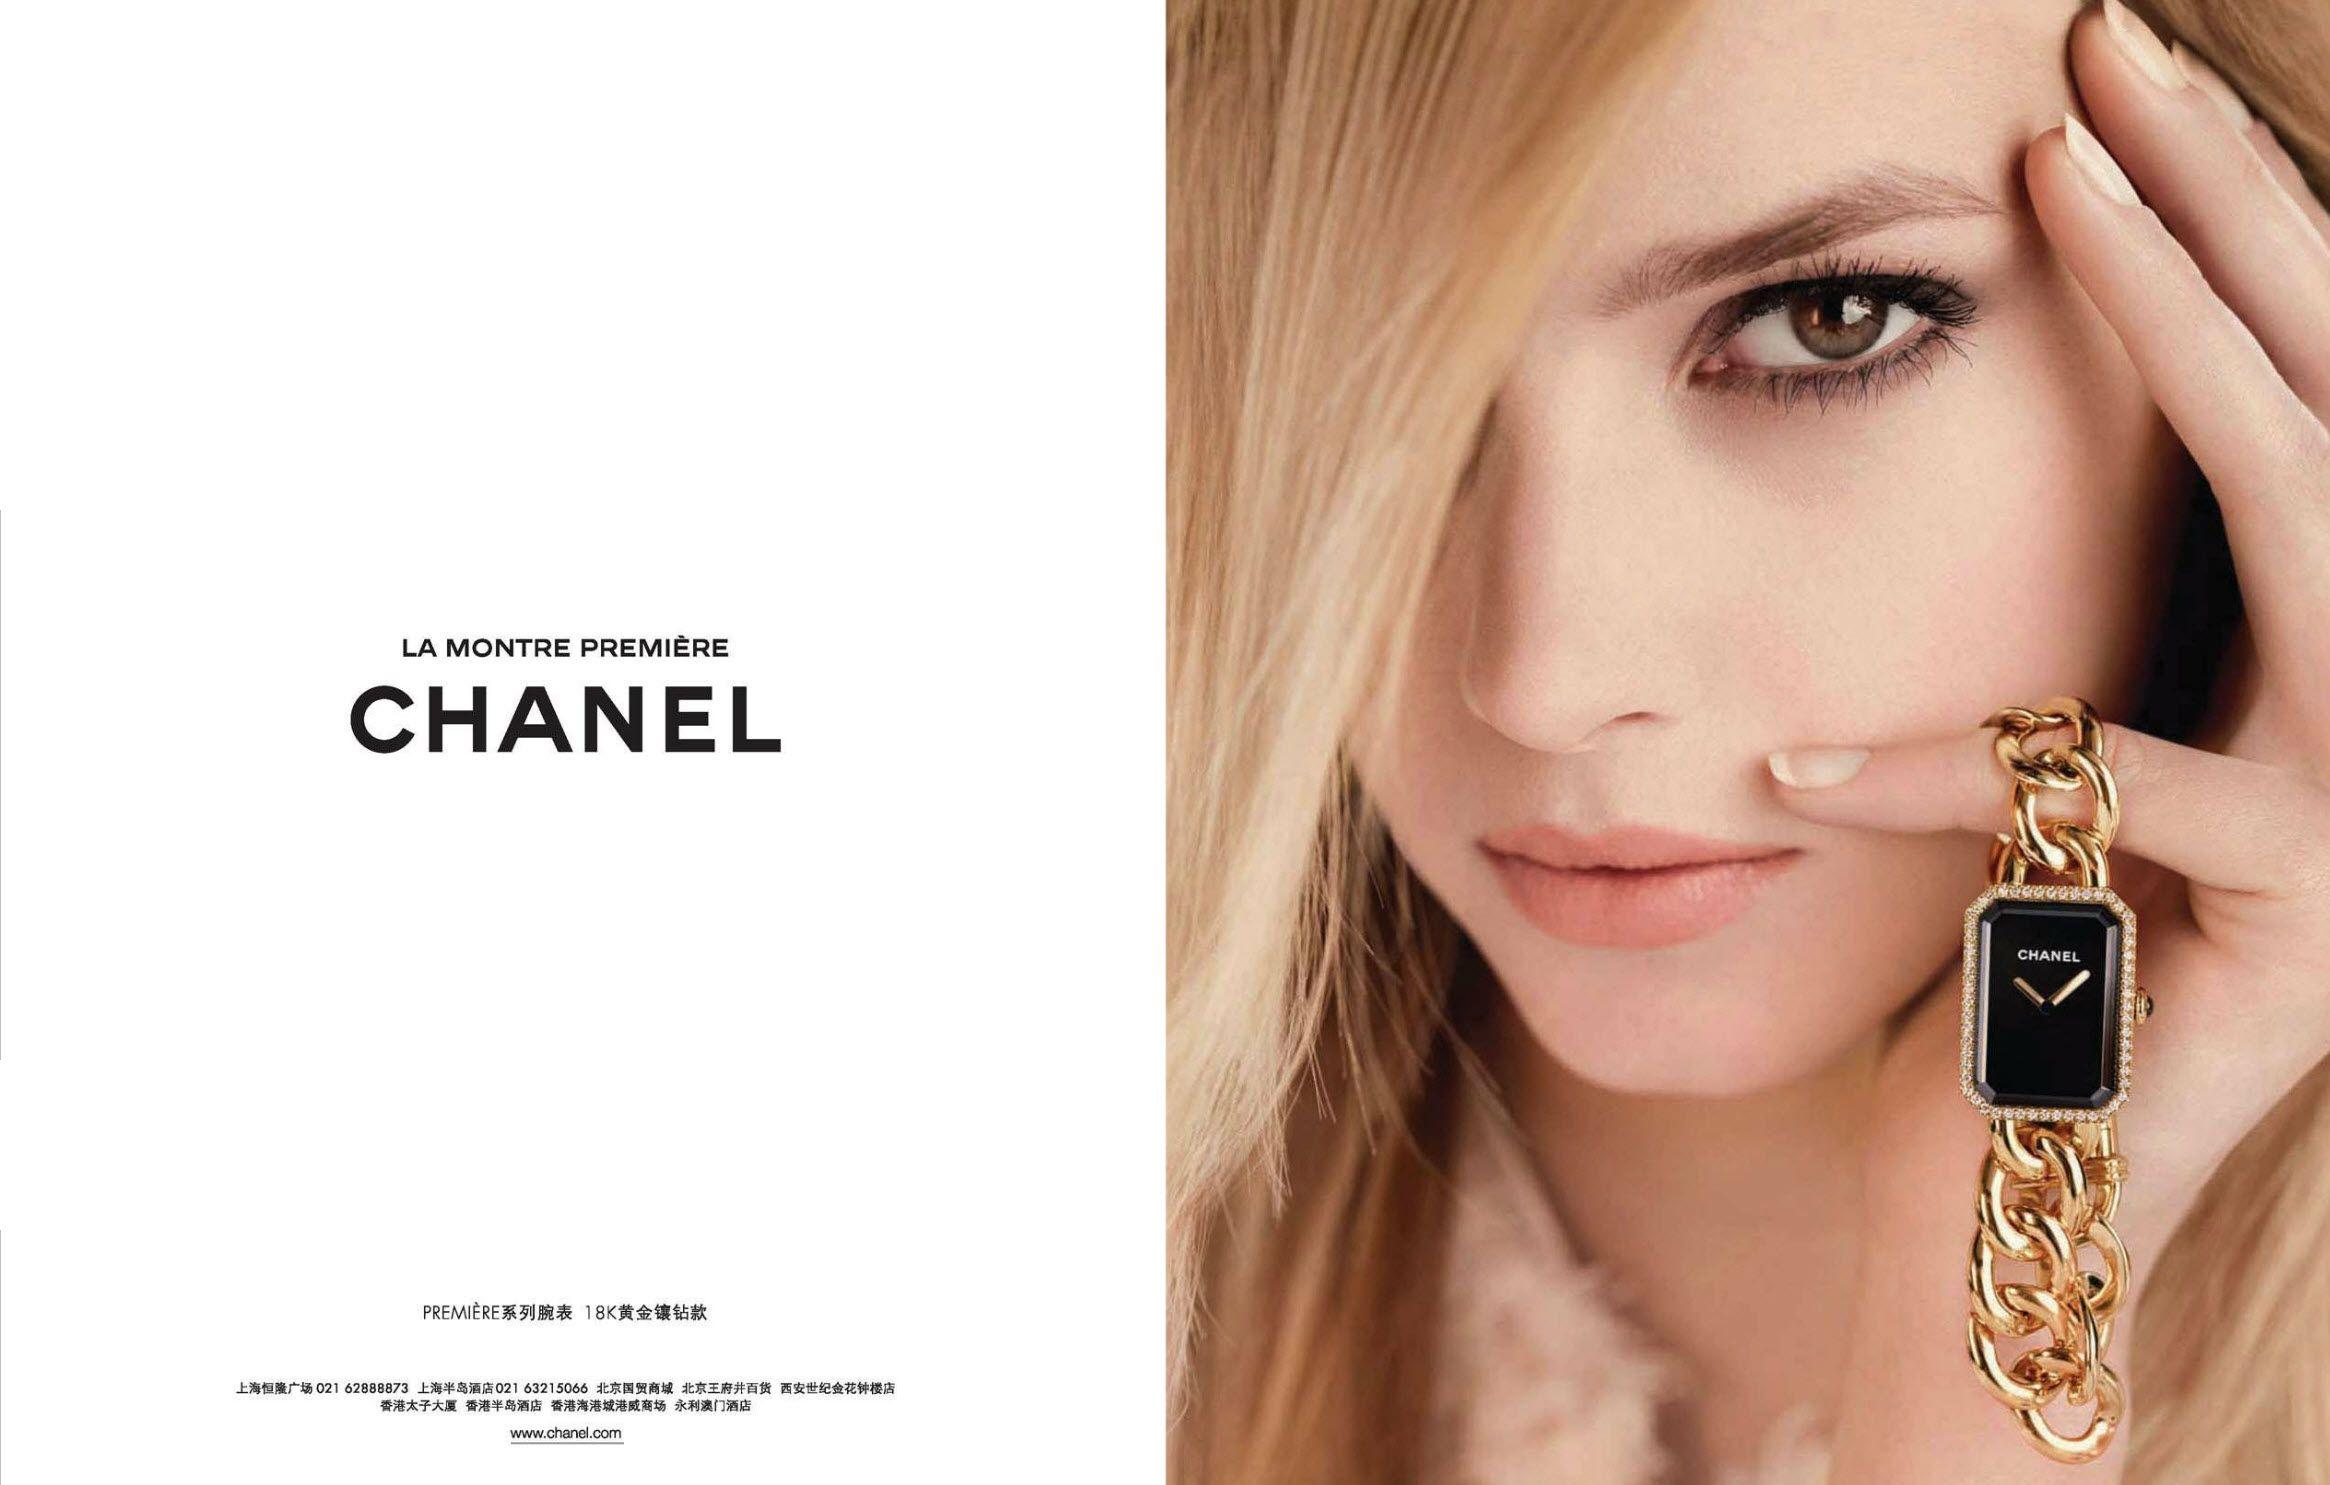 Chanel 'La Montre Première' SS 2013